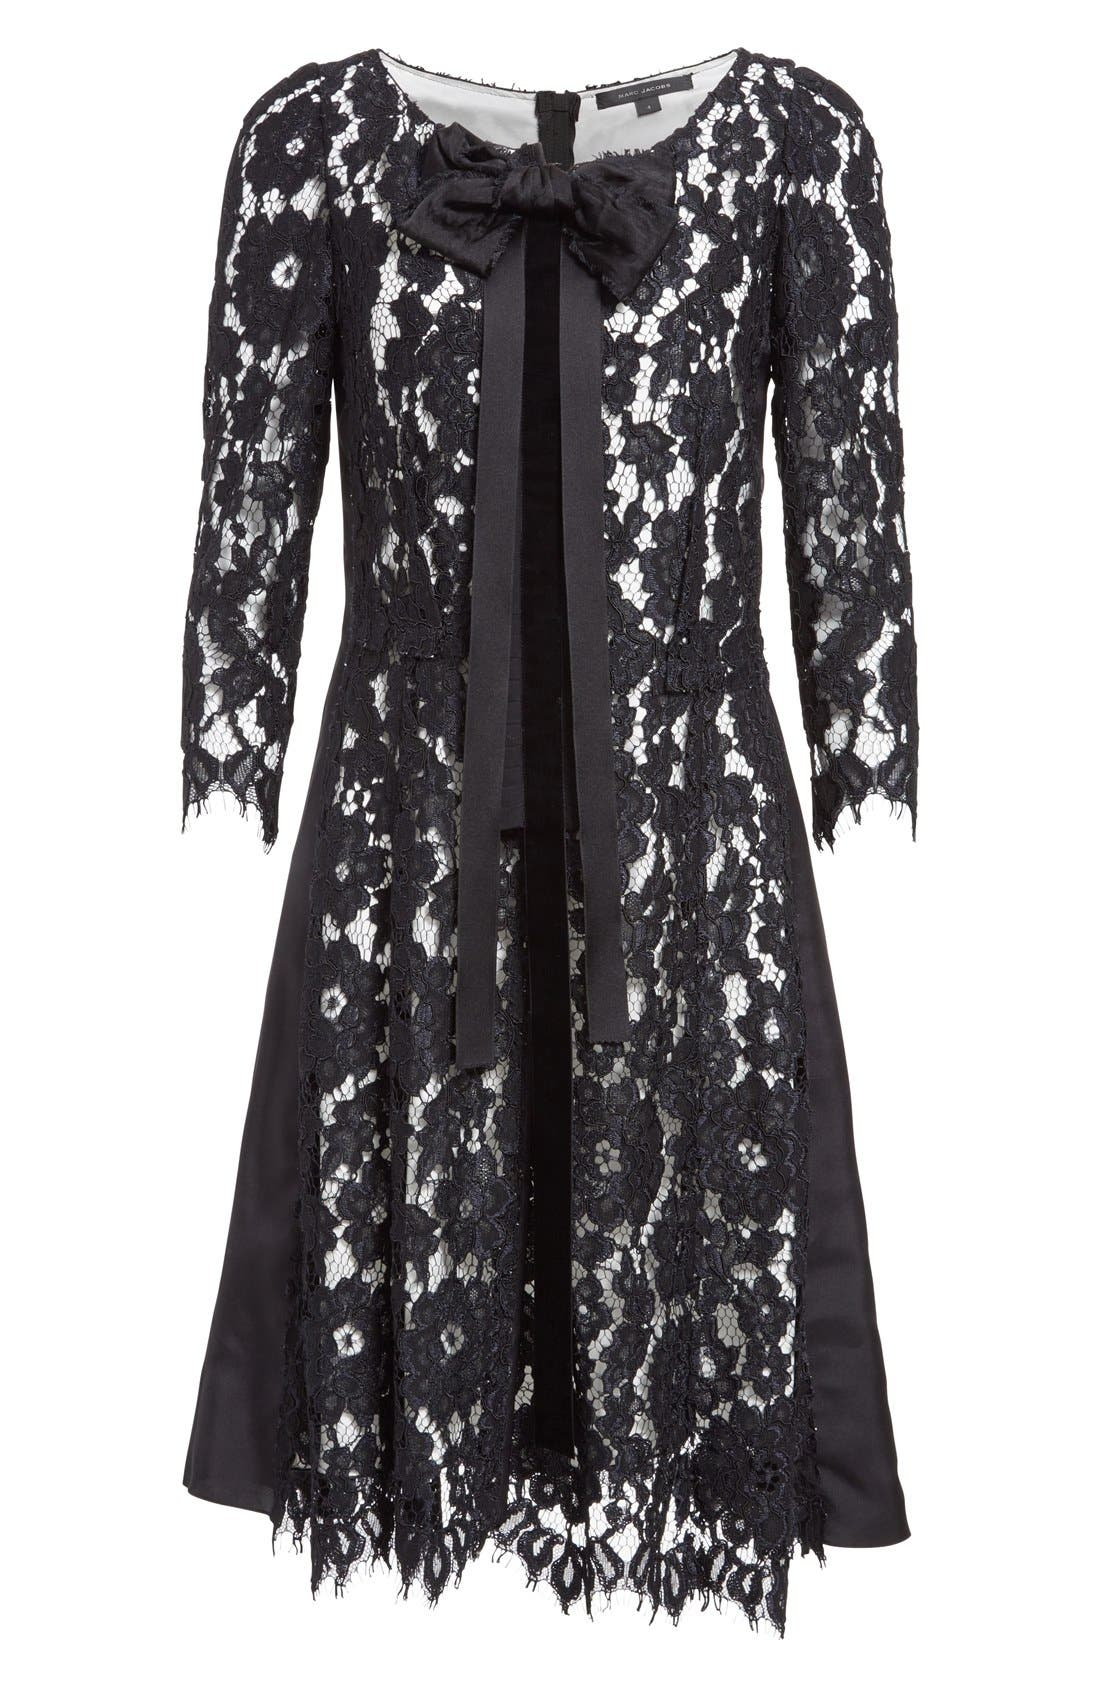 Bow Detail Lace Shift Dress,                             Alternate thumbnail 4, color,                             001